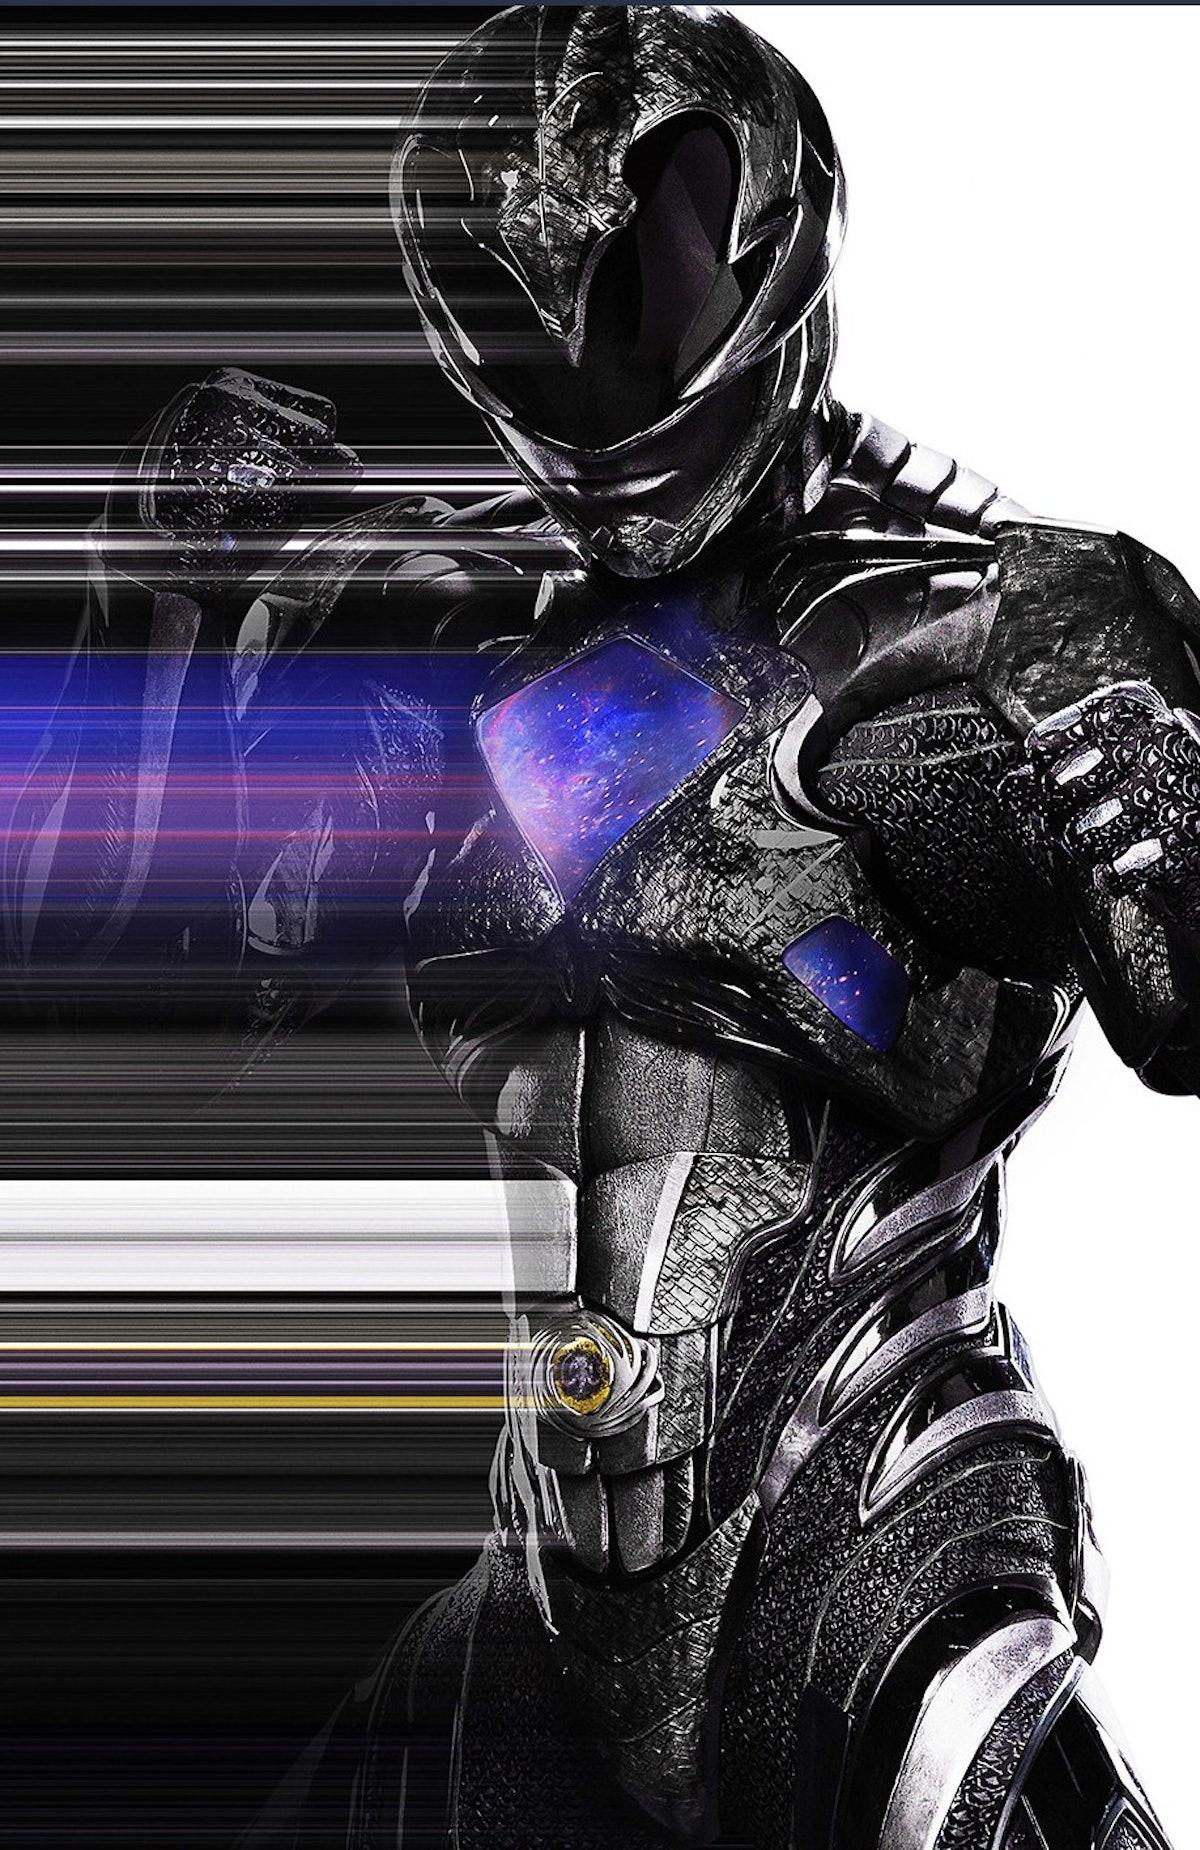 Zack - Suit Character Poster.jpg